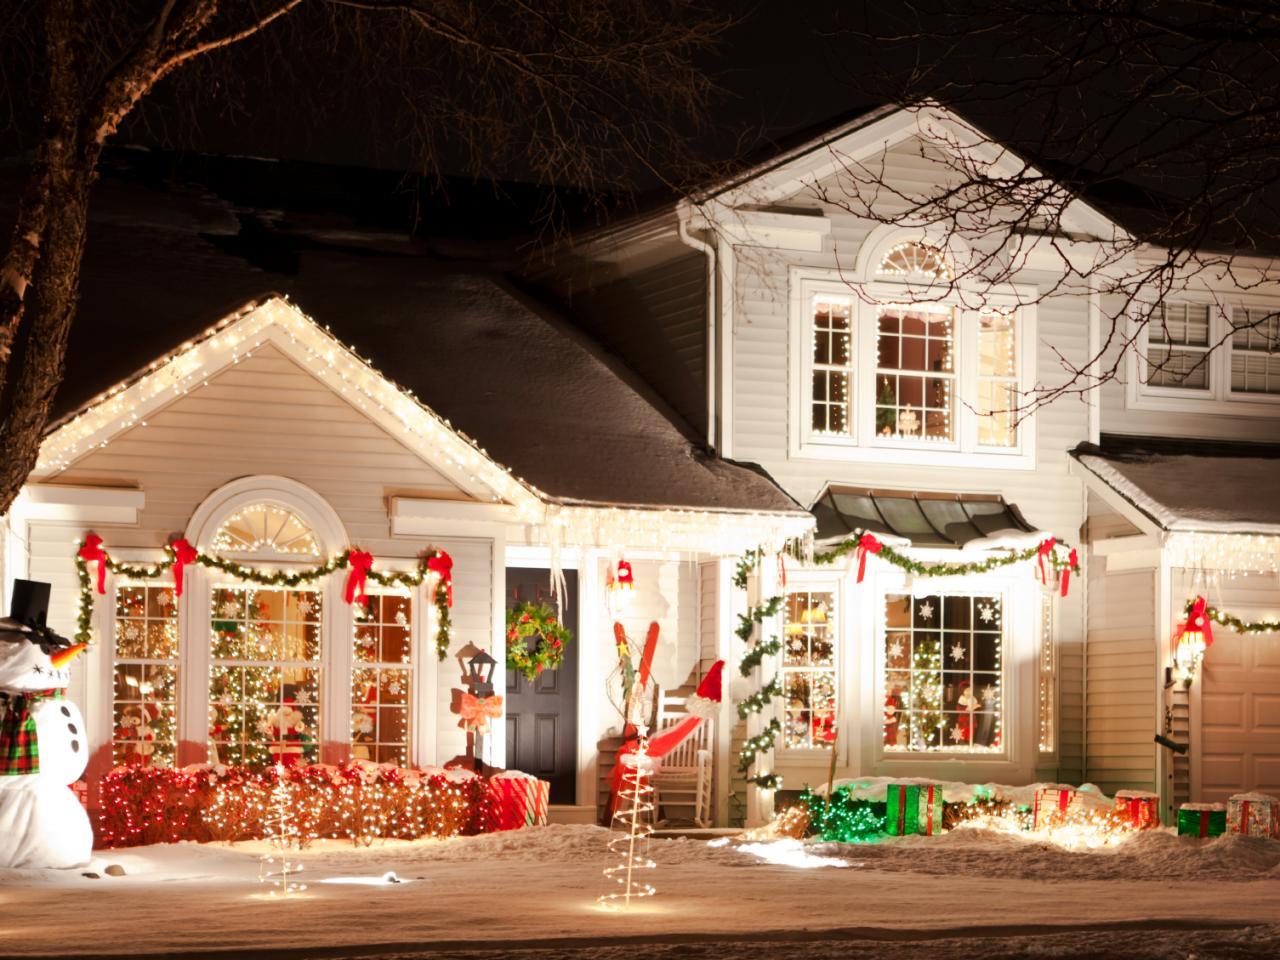 c9-outdoor-christmas-lights-photo-16